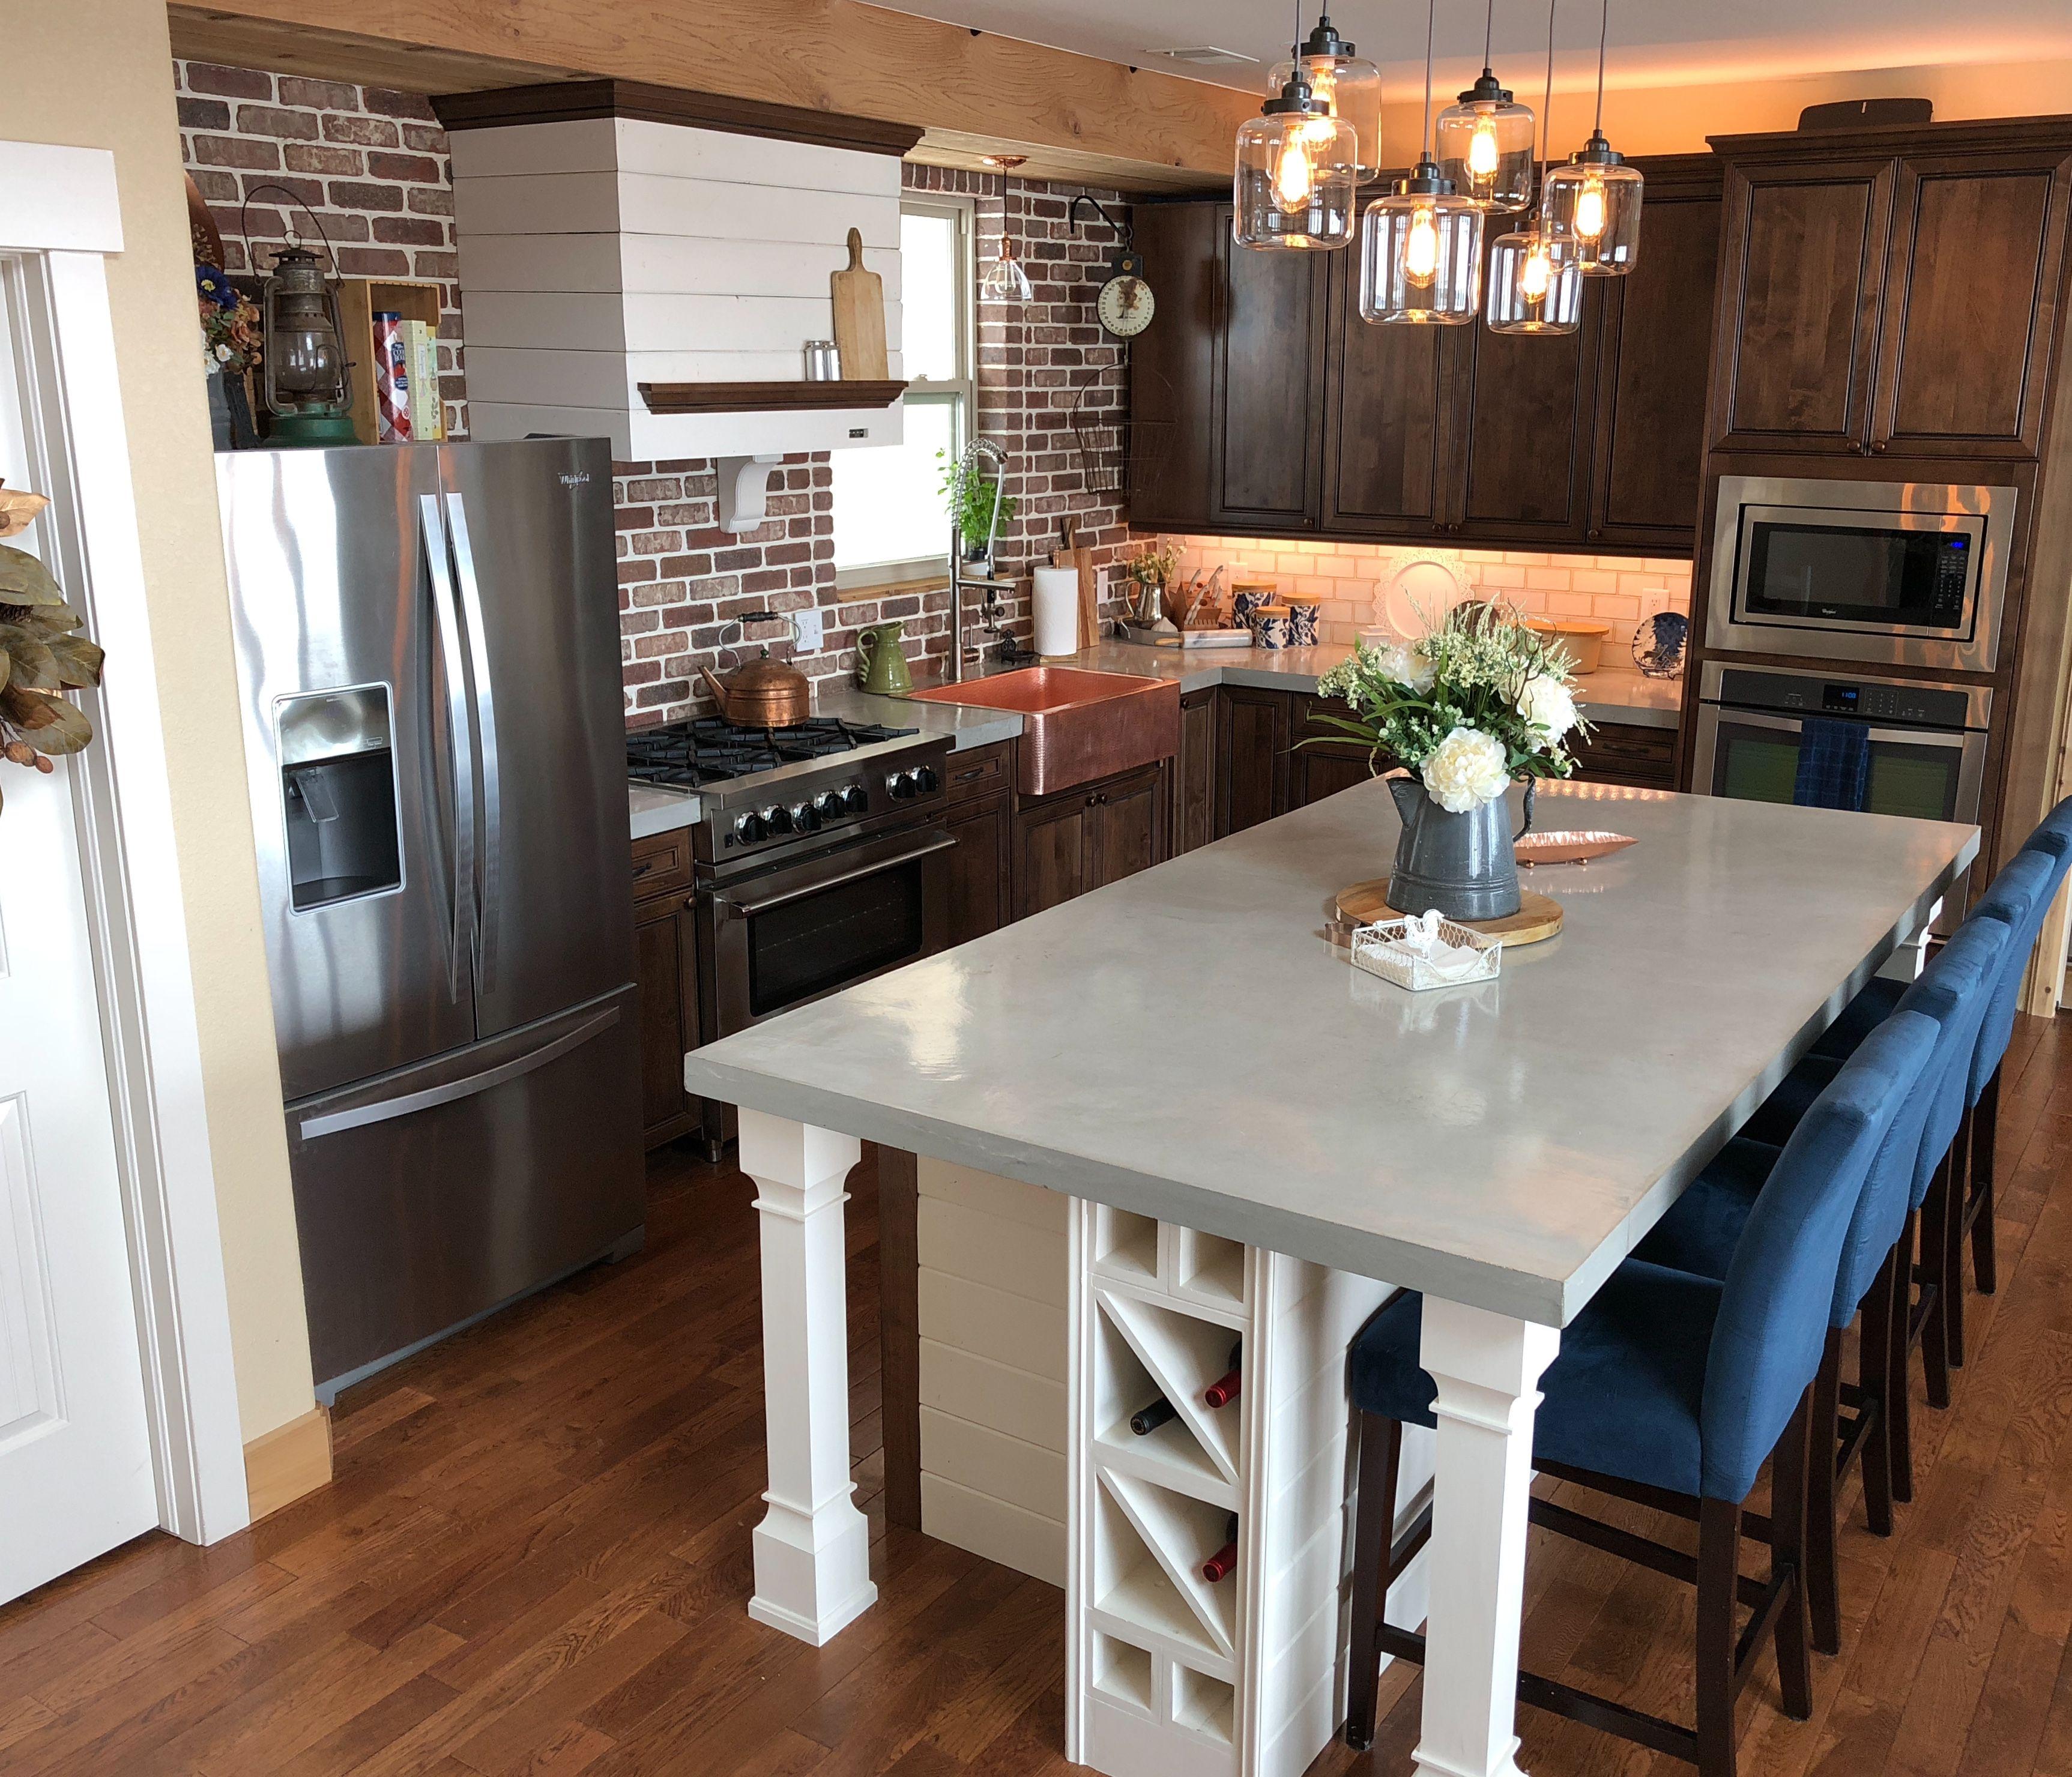 Diy Concrete Countertops Kitchen Remodel Countertops Kitchen